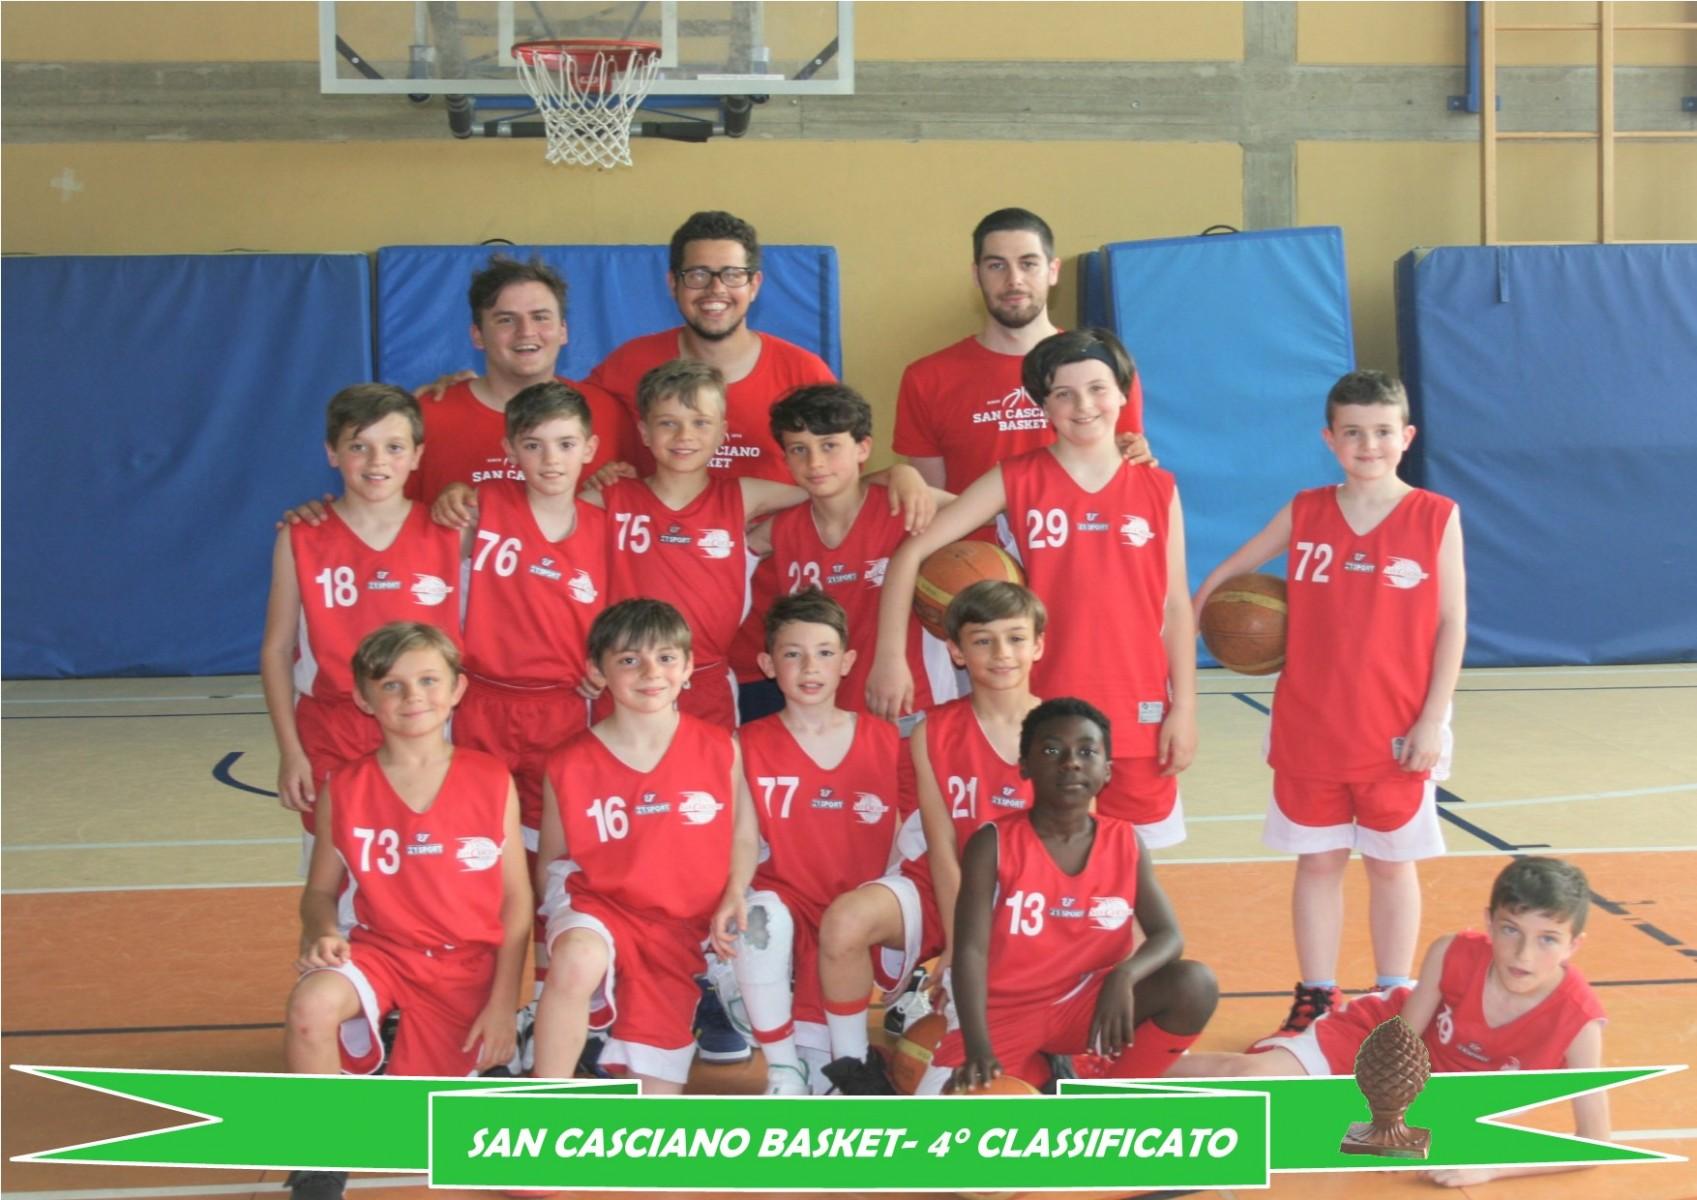 San-Casciano-Basket